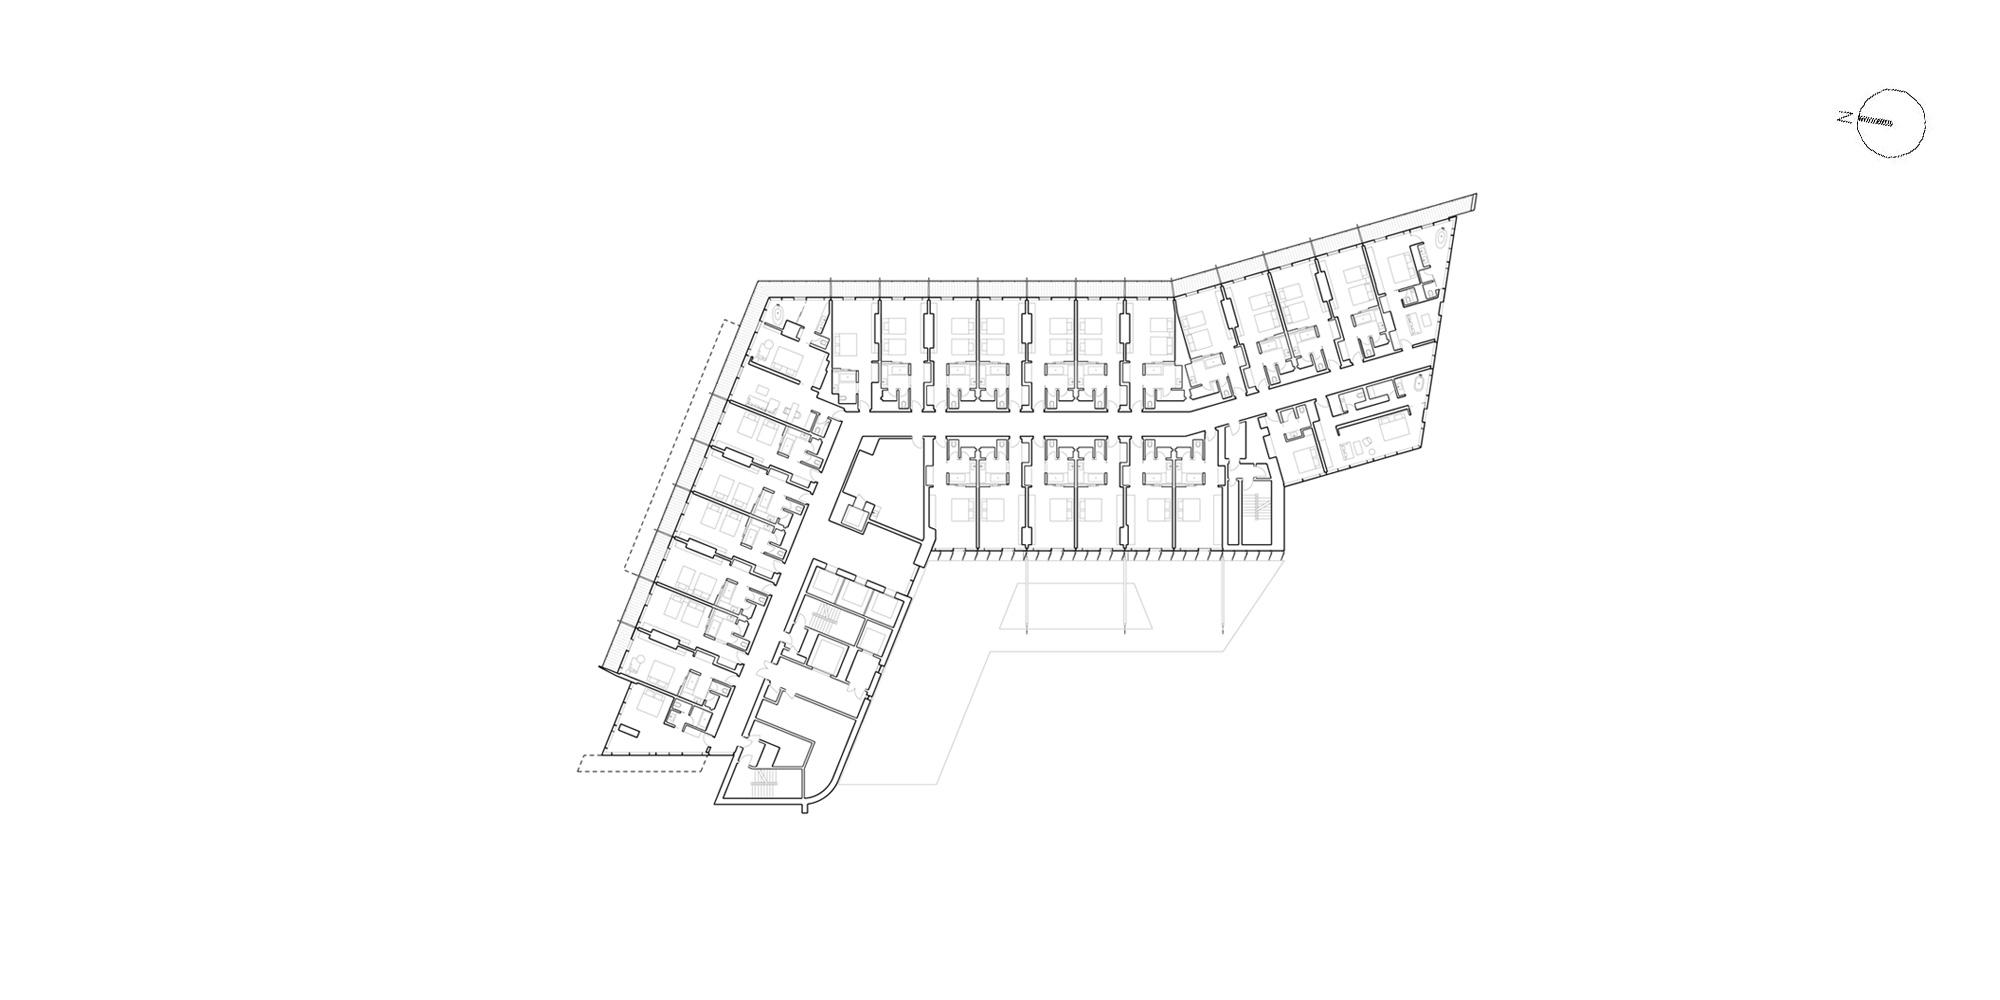 3rd Floor Plan © Richard Meier & Partners Architects